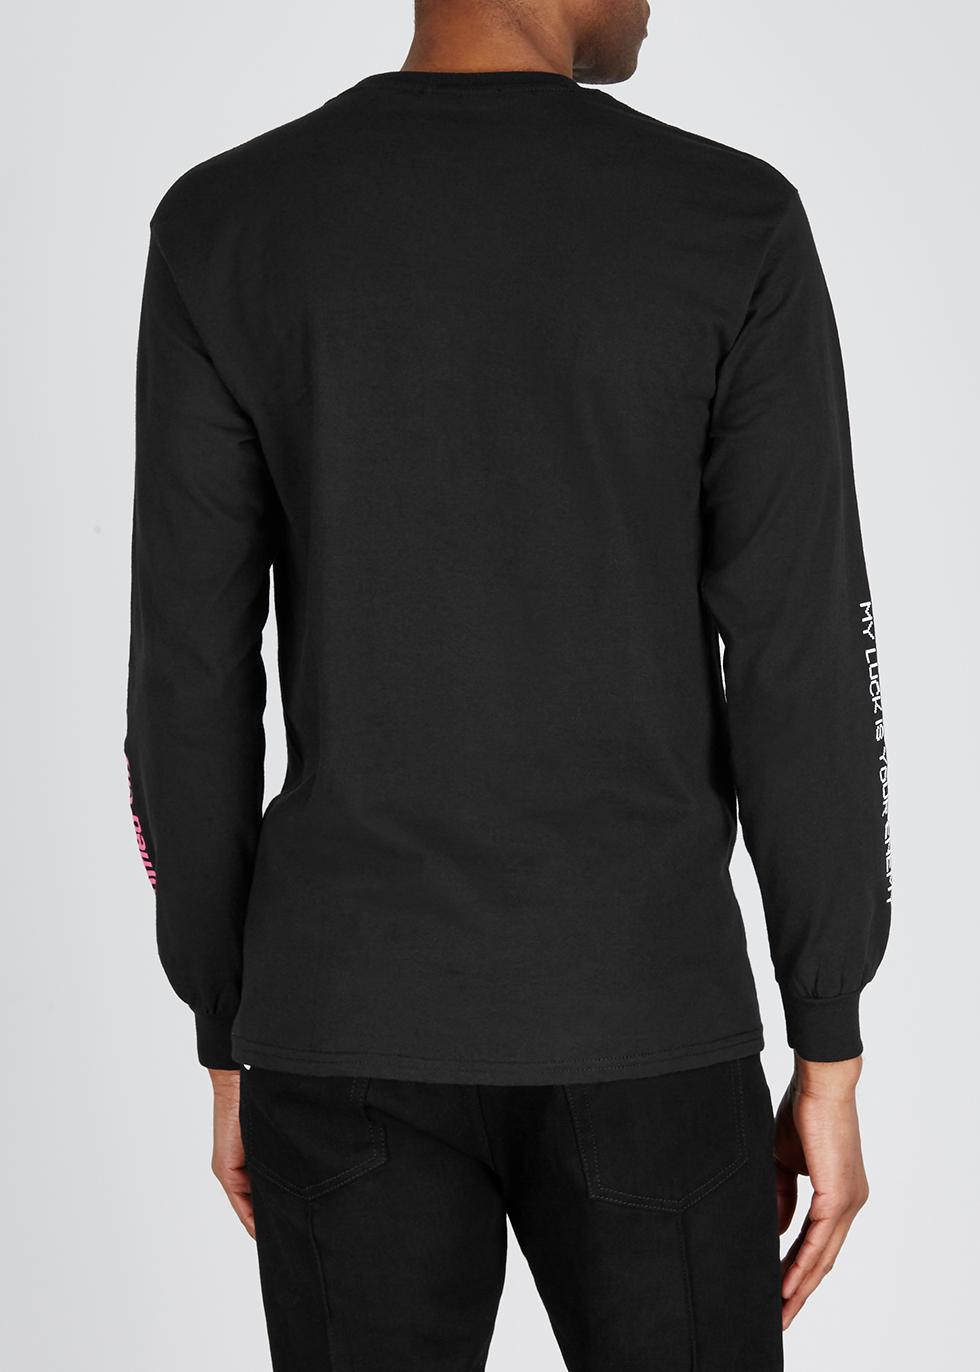 Black cotton T-shirt - Flagstuff